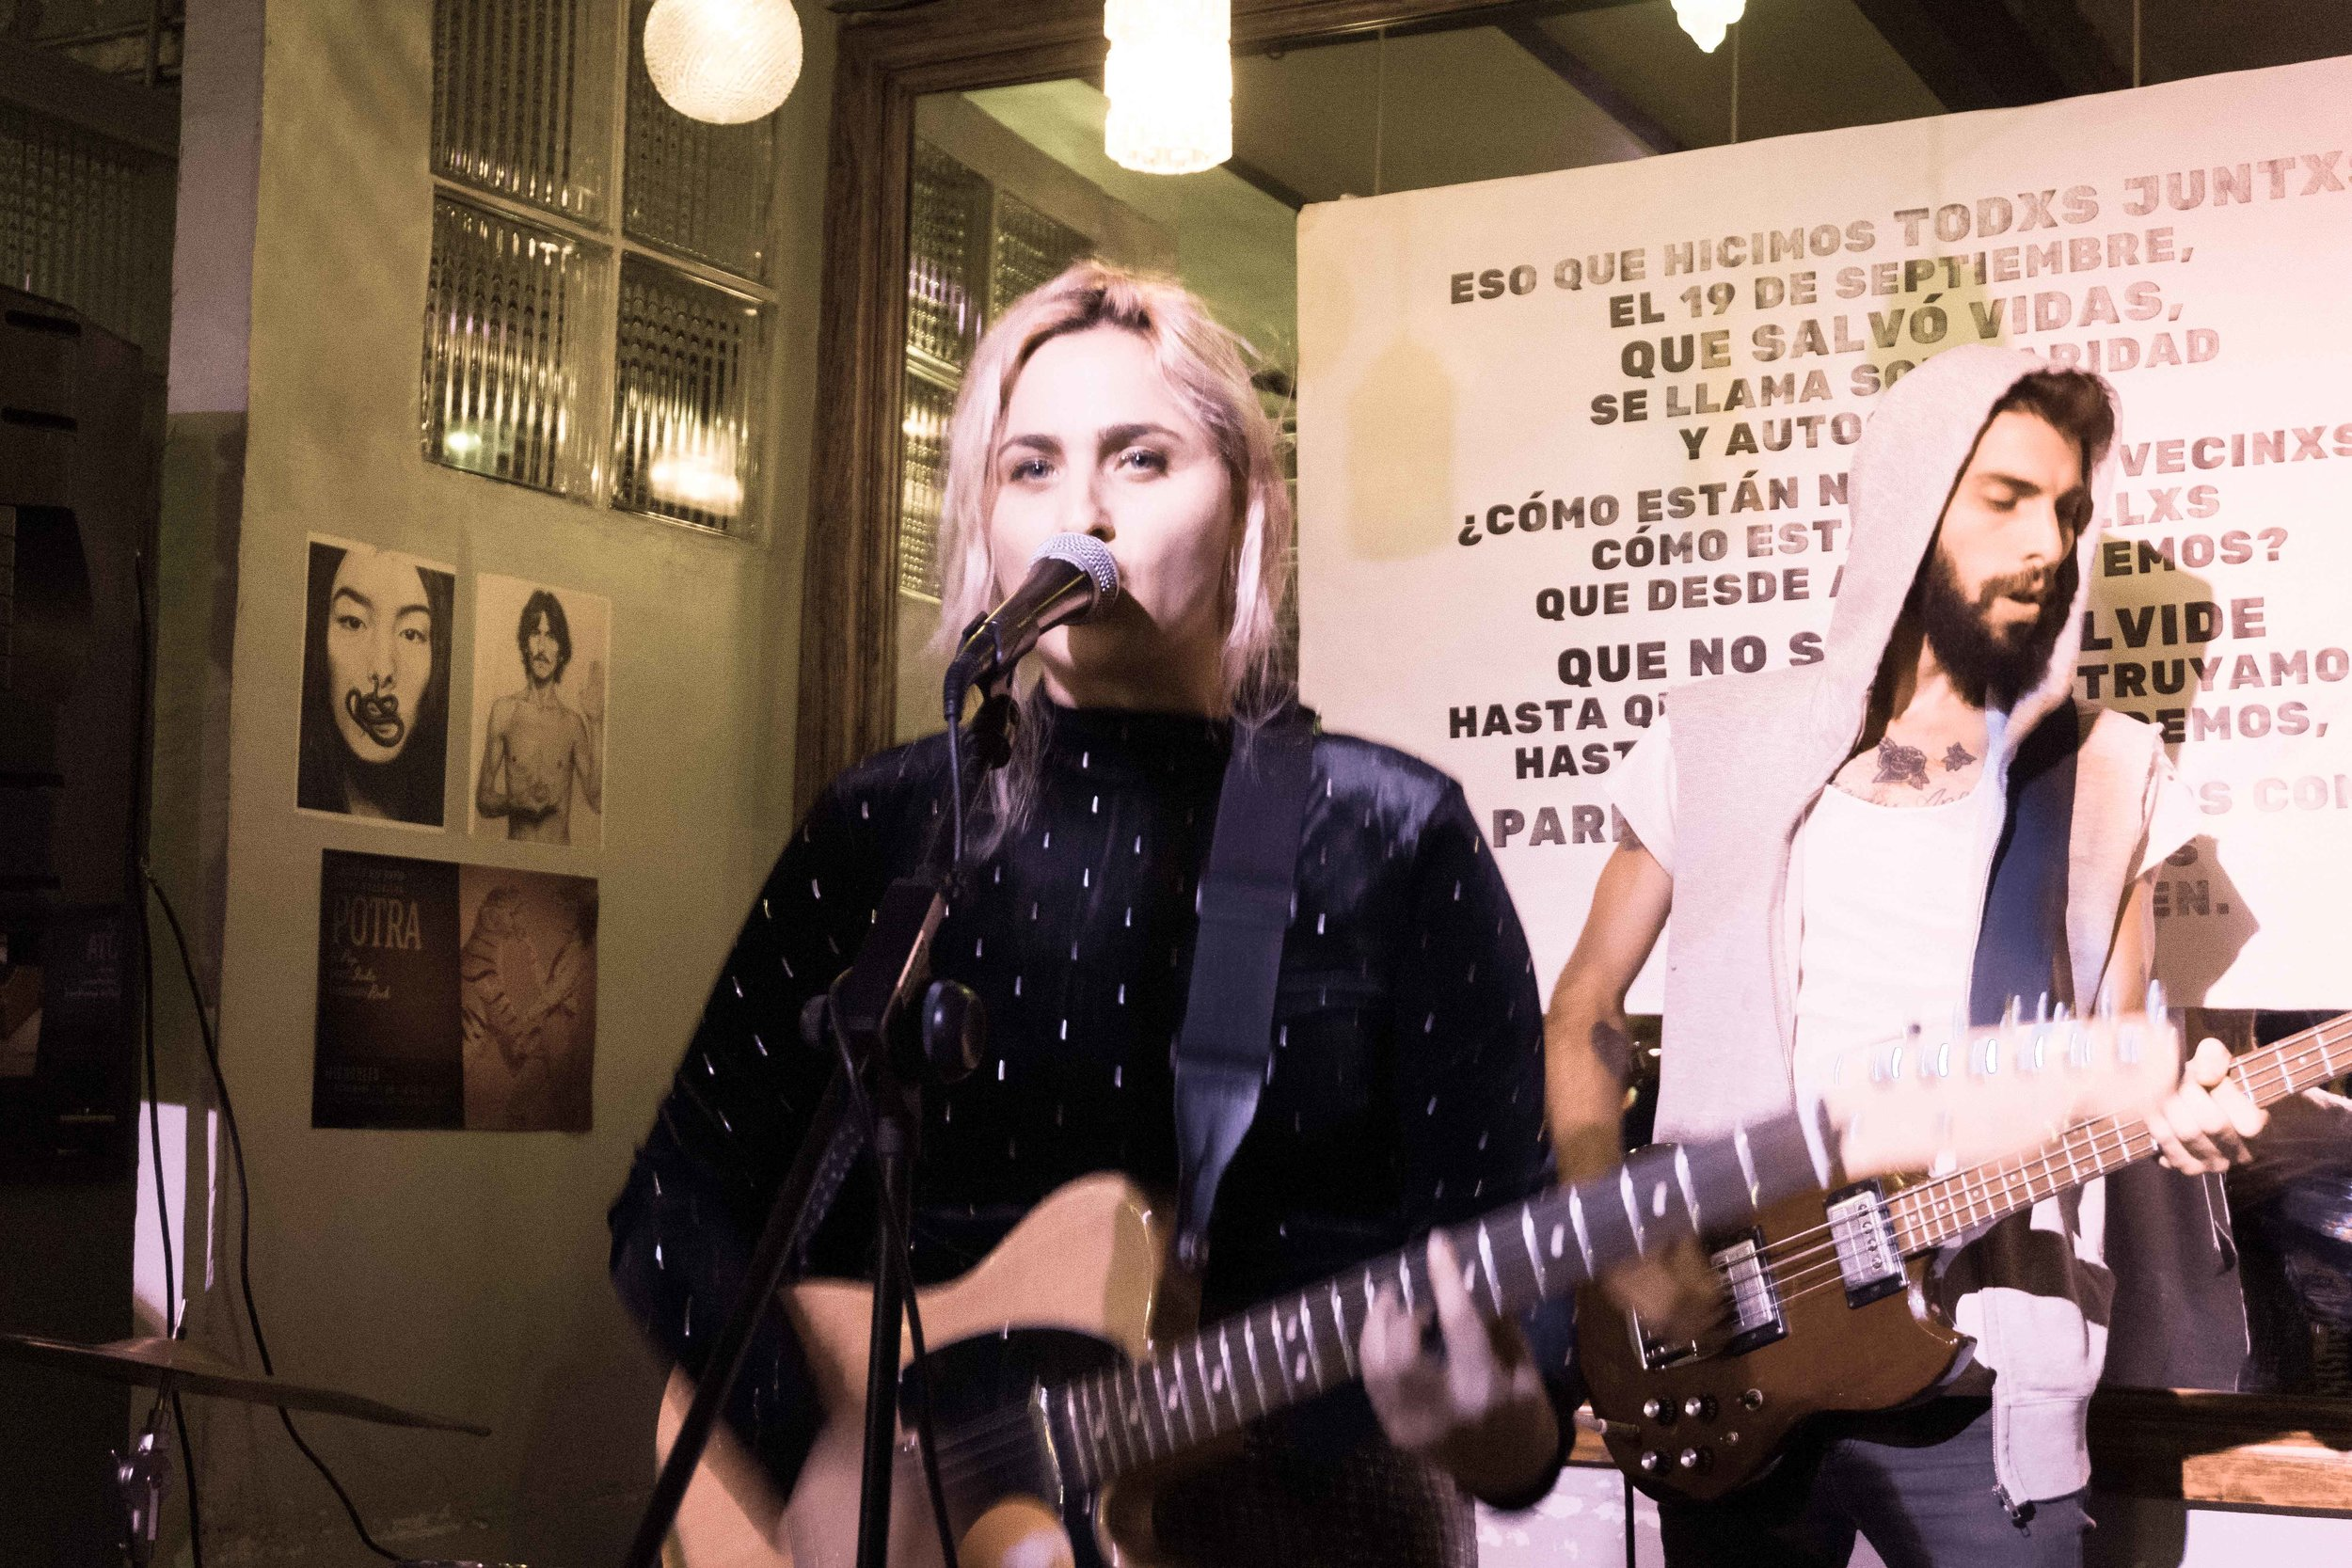 LR_potra singing.jpg